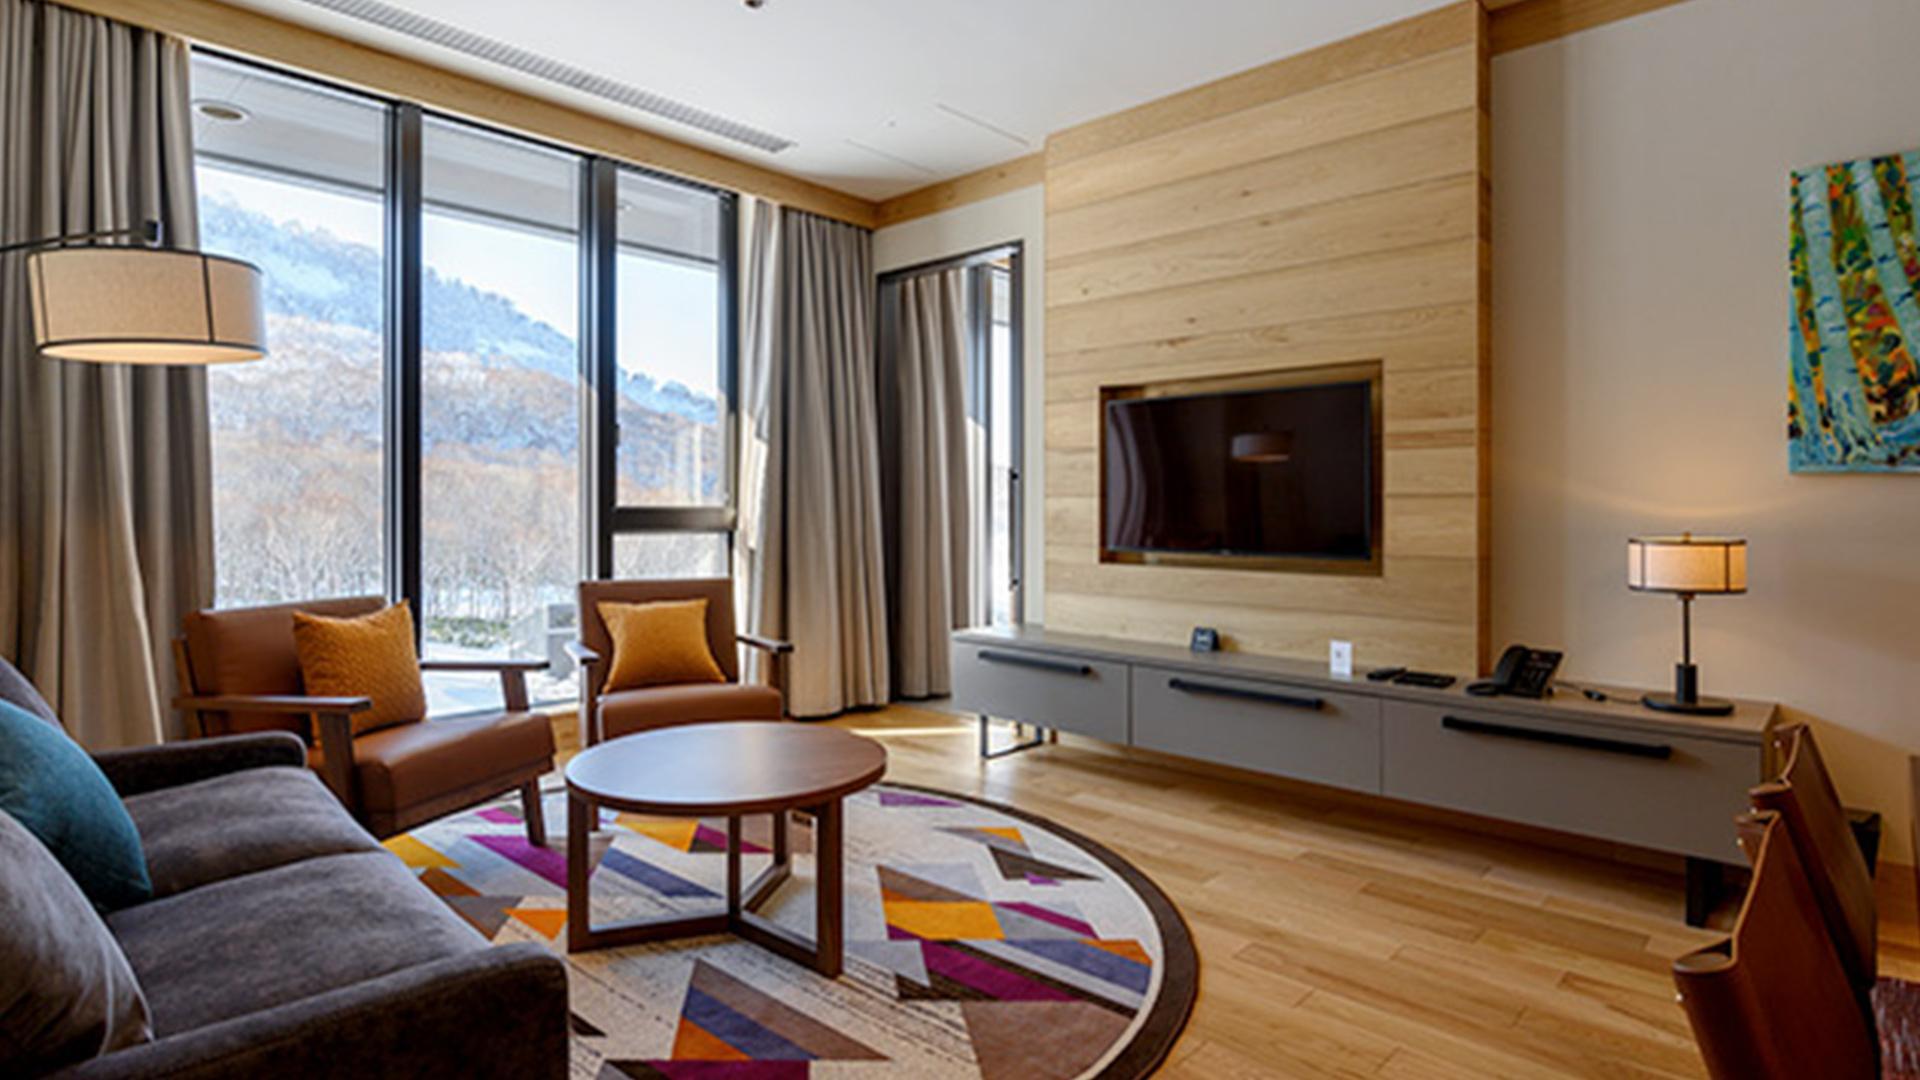 Two-Bedroom Suite image 1 at Yu Kiroro by Yoichi District, Hokkaido, Japan